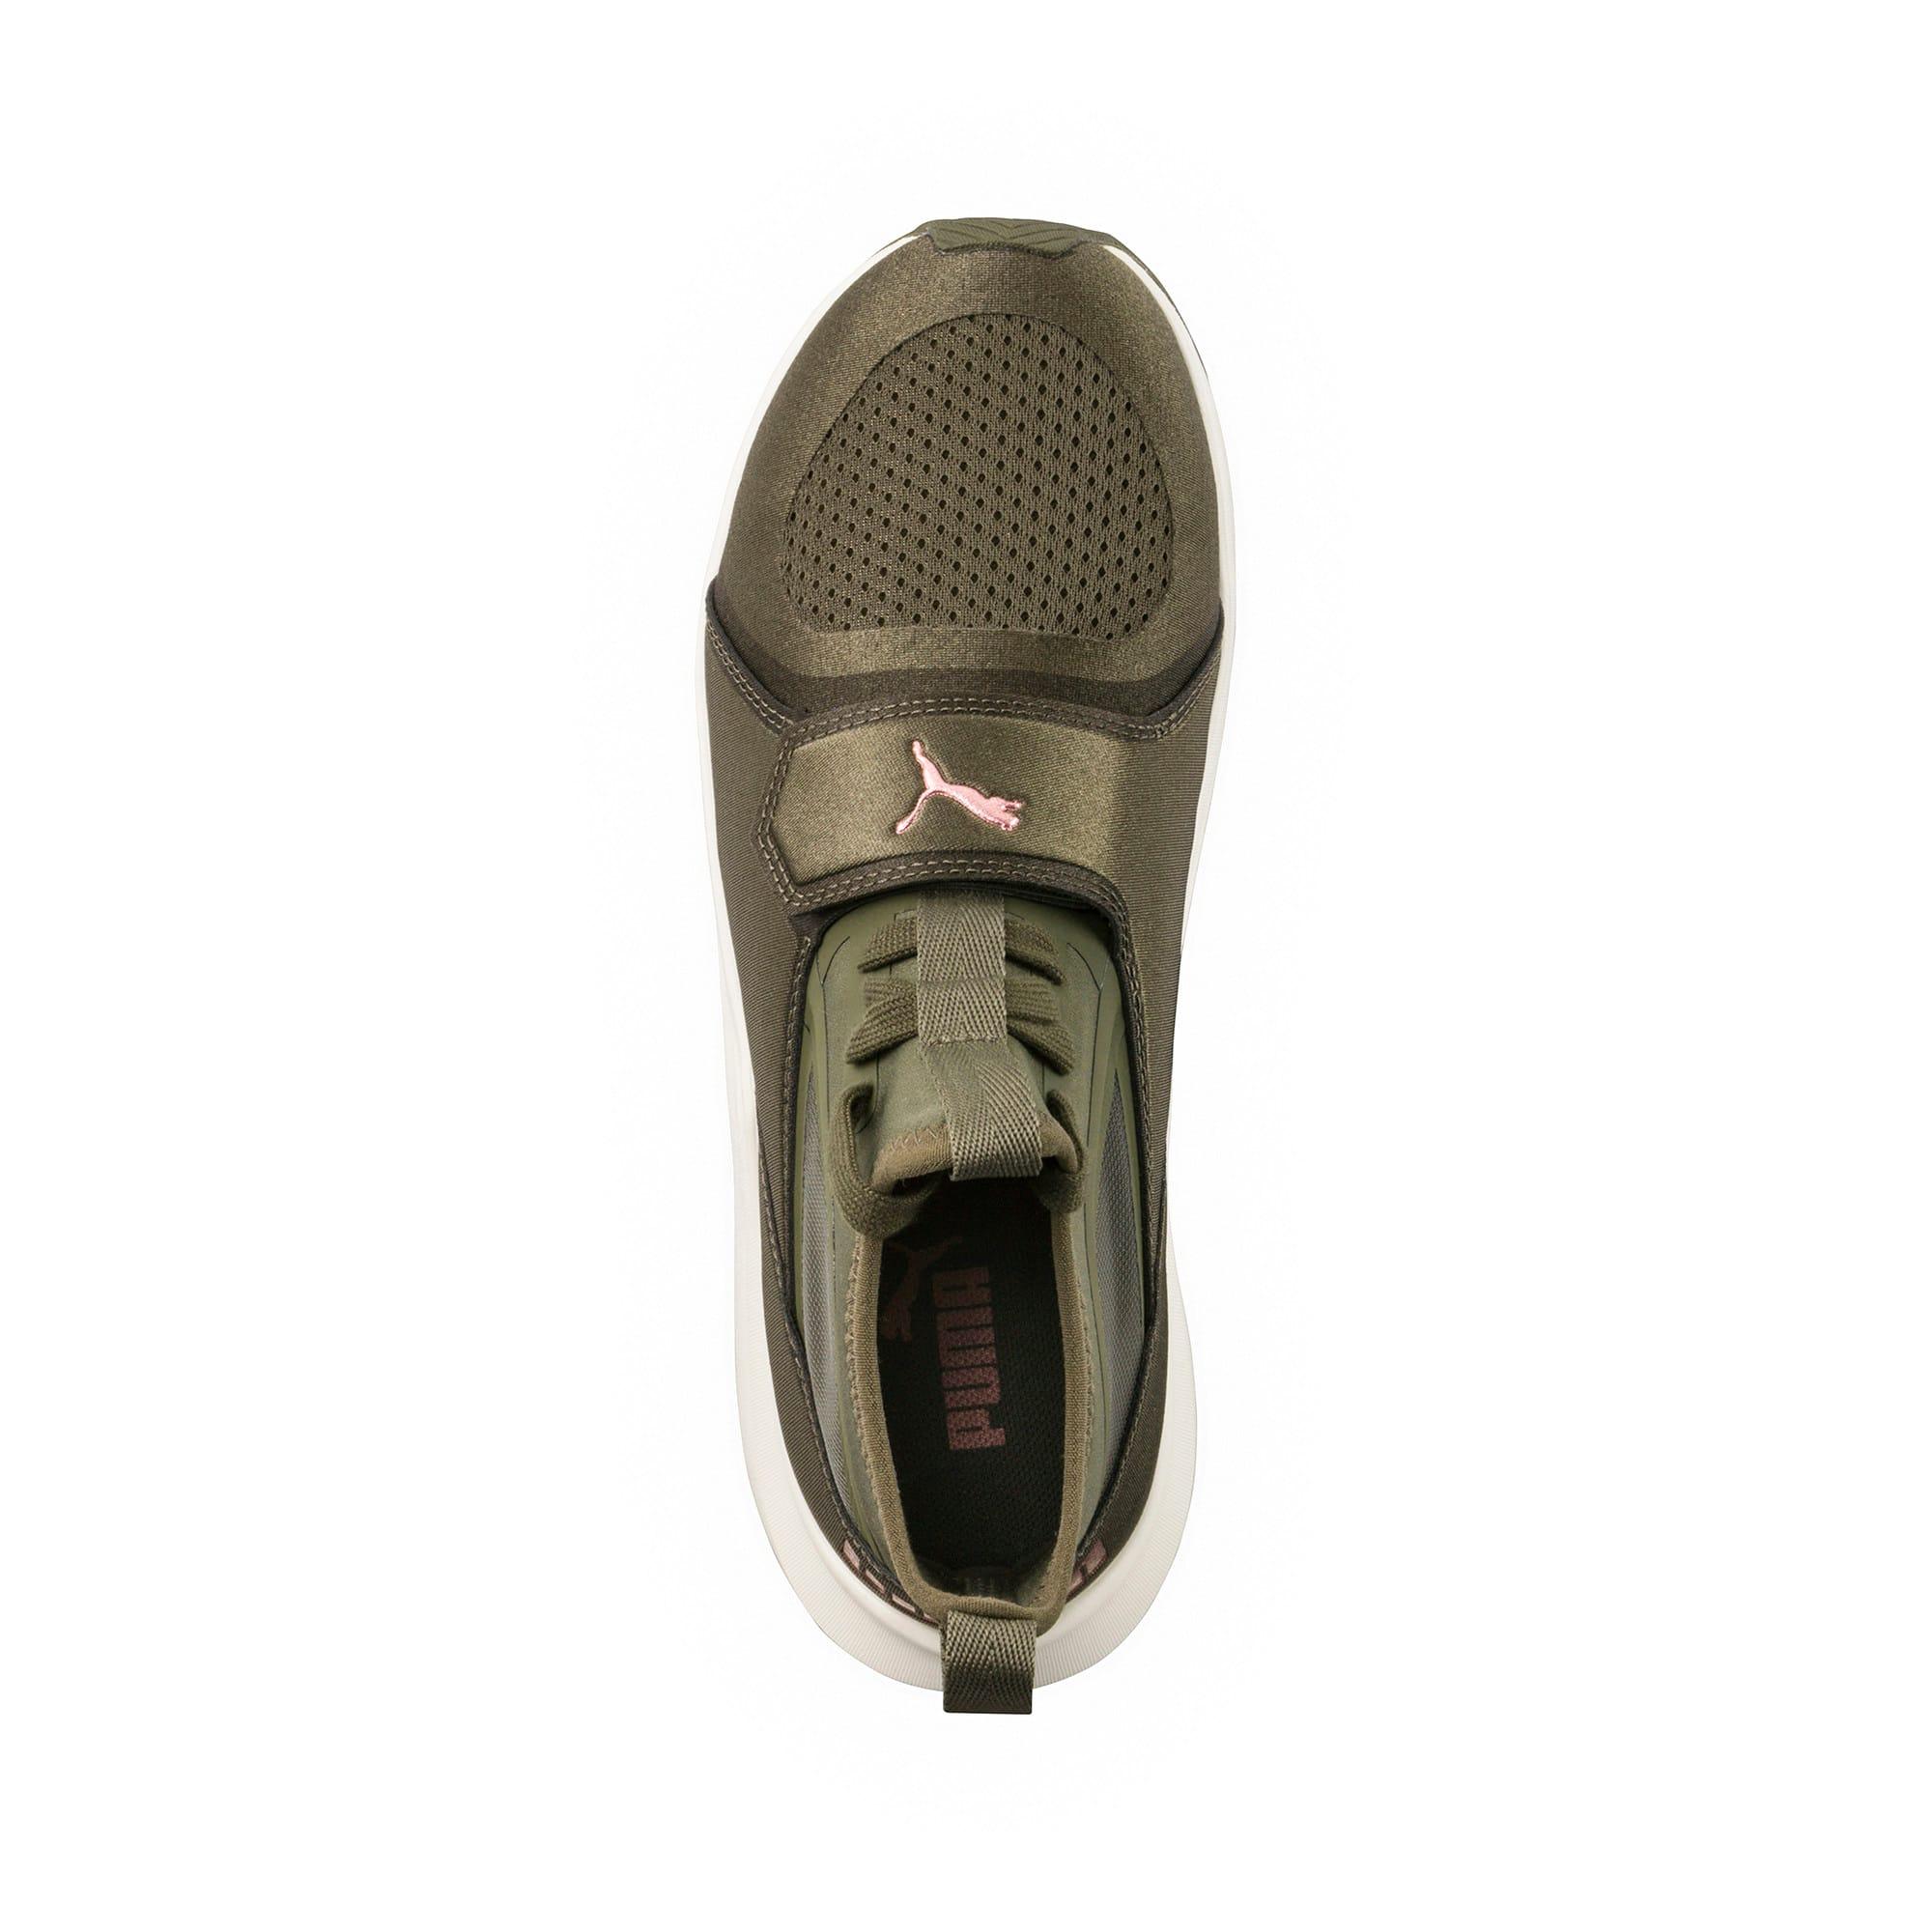 Thumbnail 5 of Phenom Women's Training Shoes, Olive Night-Whisper White, medium